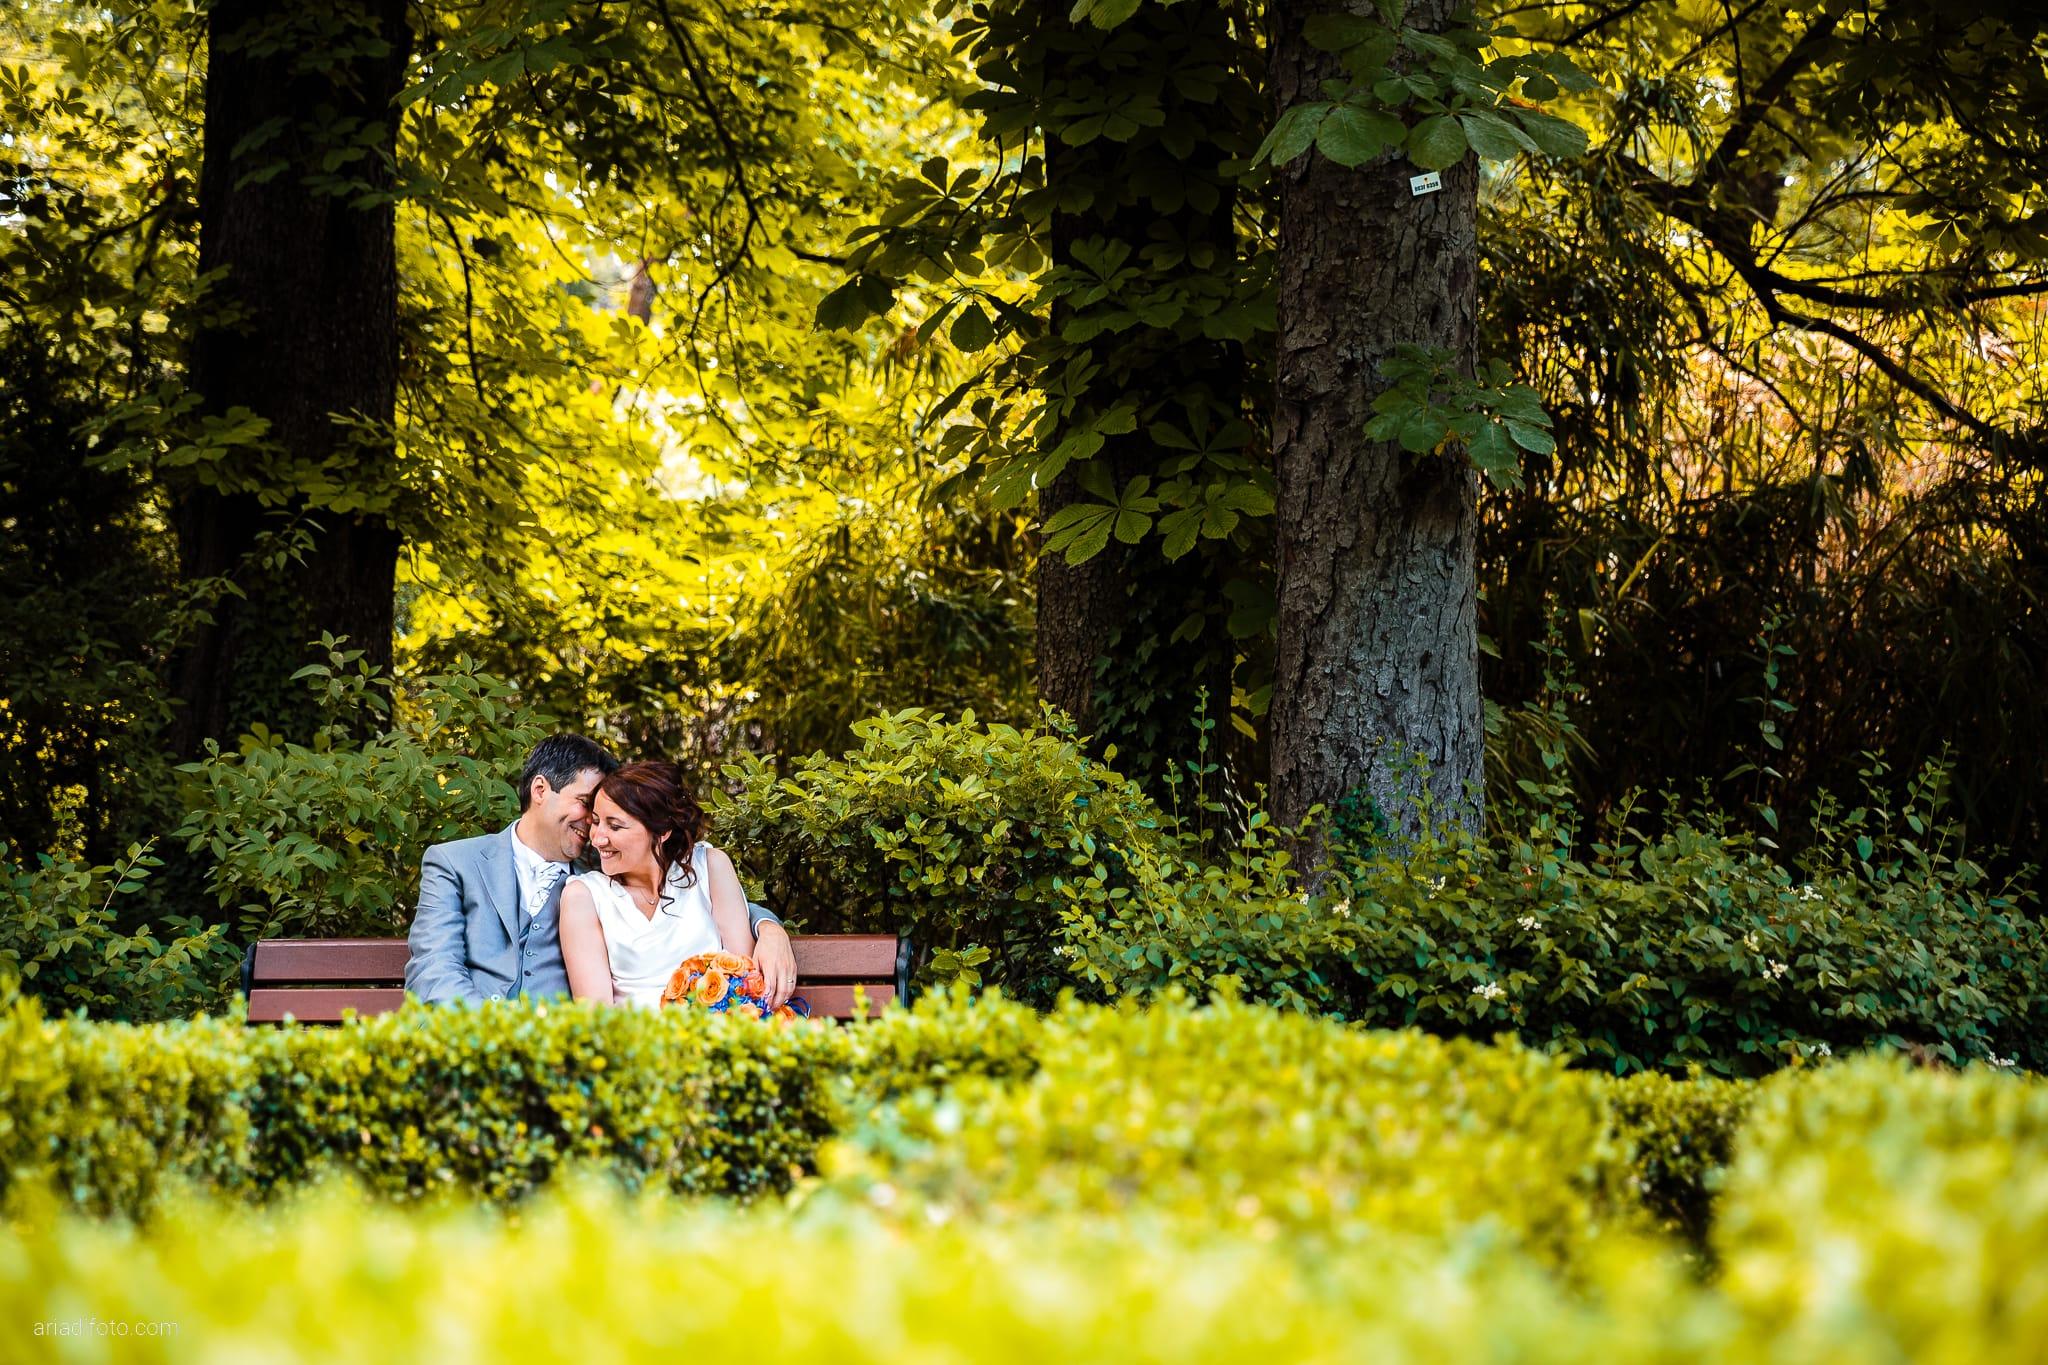 Elisa Diego matrimonio Villa Revoltella Trieste Paradiso Pocenia Udine ritratti sposi parco